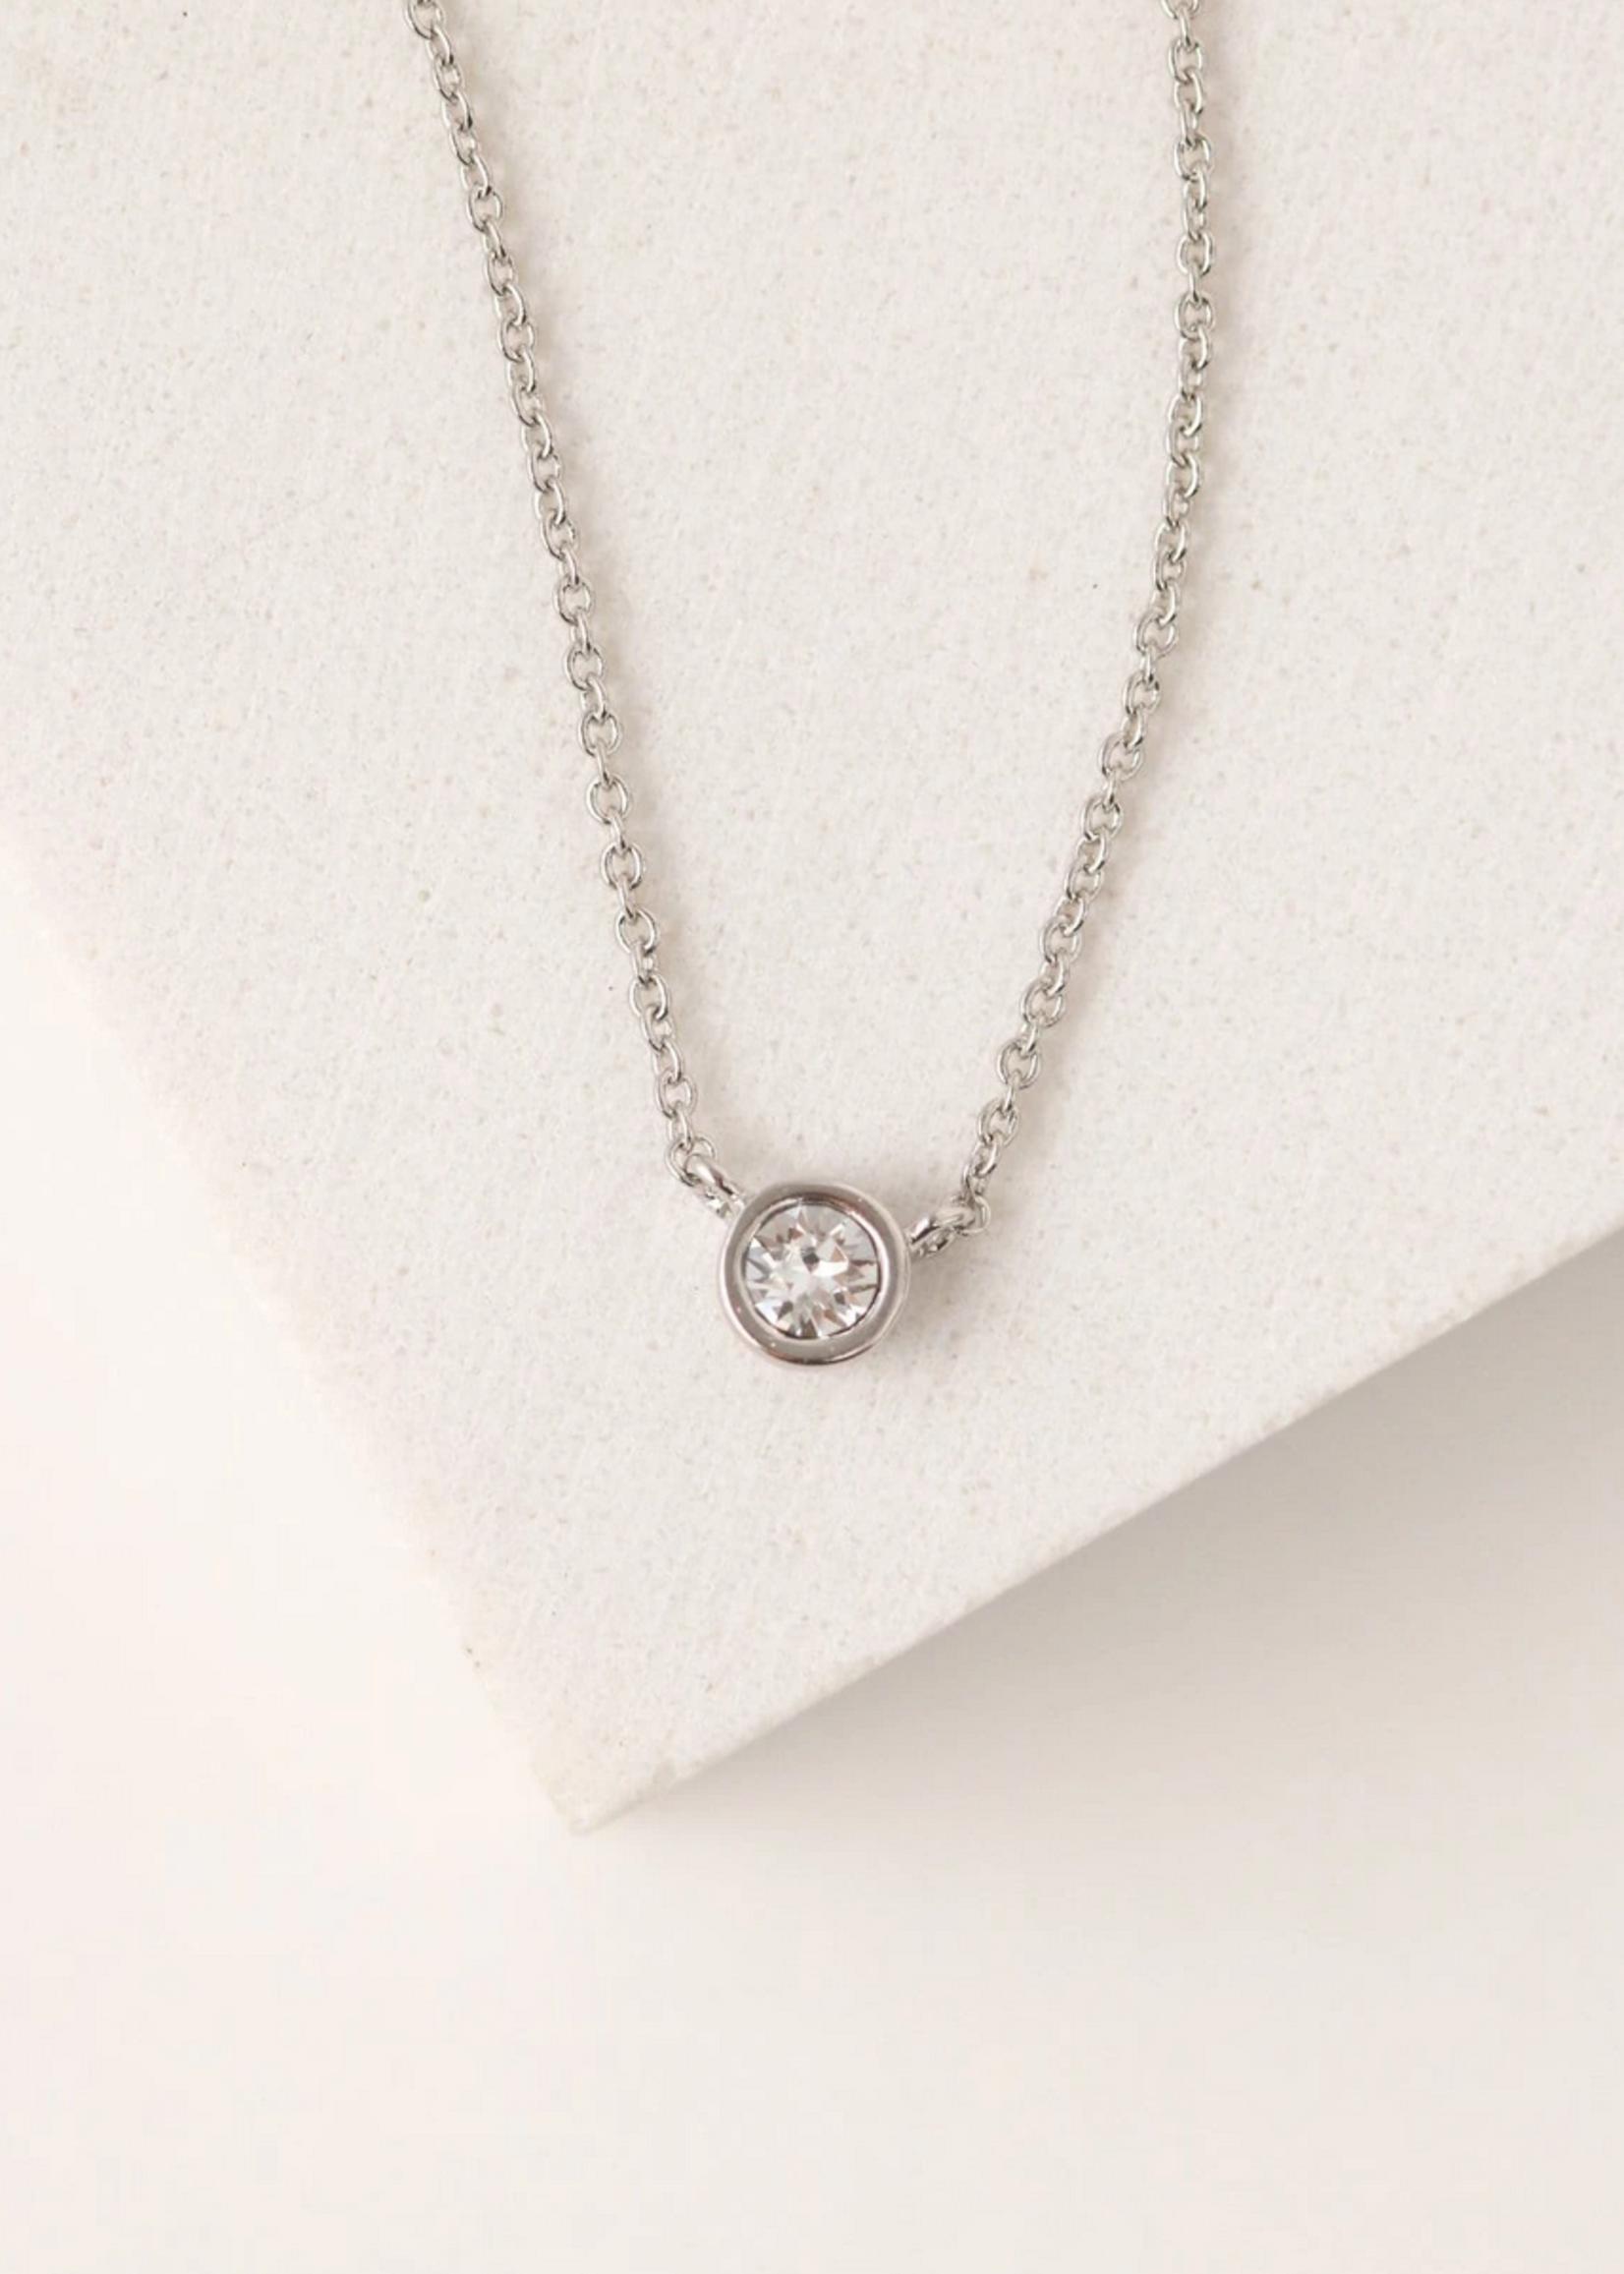 April kaleidoscope Birthstone Necklace-Silver